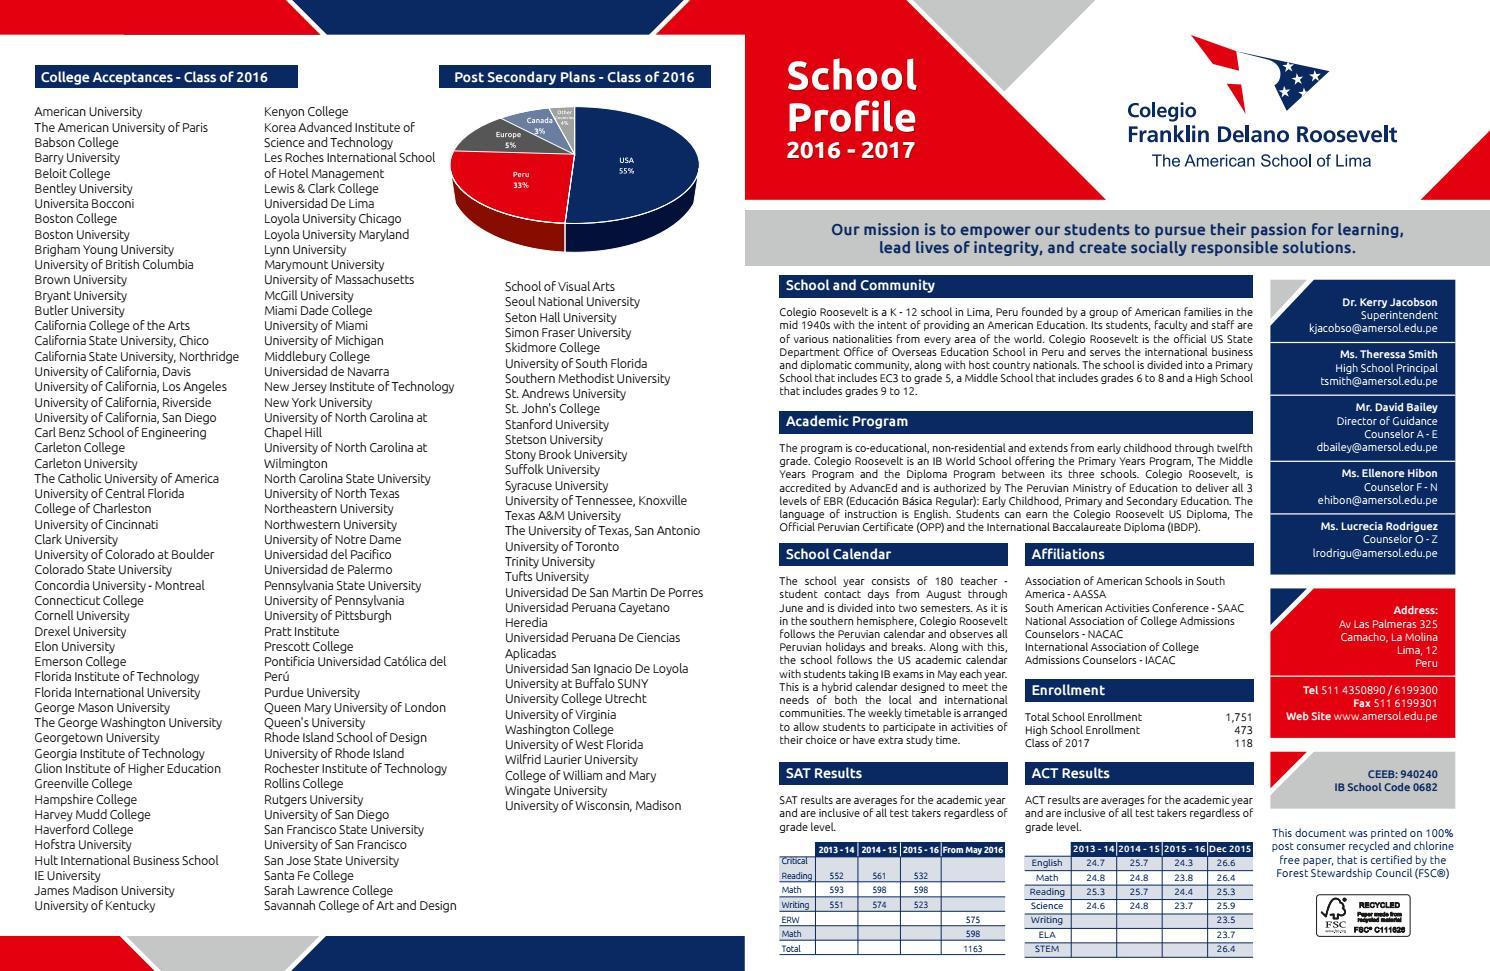 Colegio Roosevelt Profile 2016-17 by ColegioRoosevelt - issuu